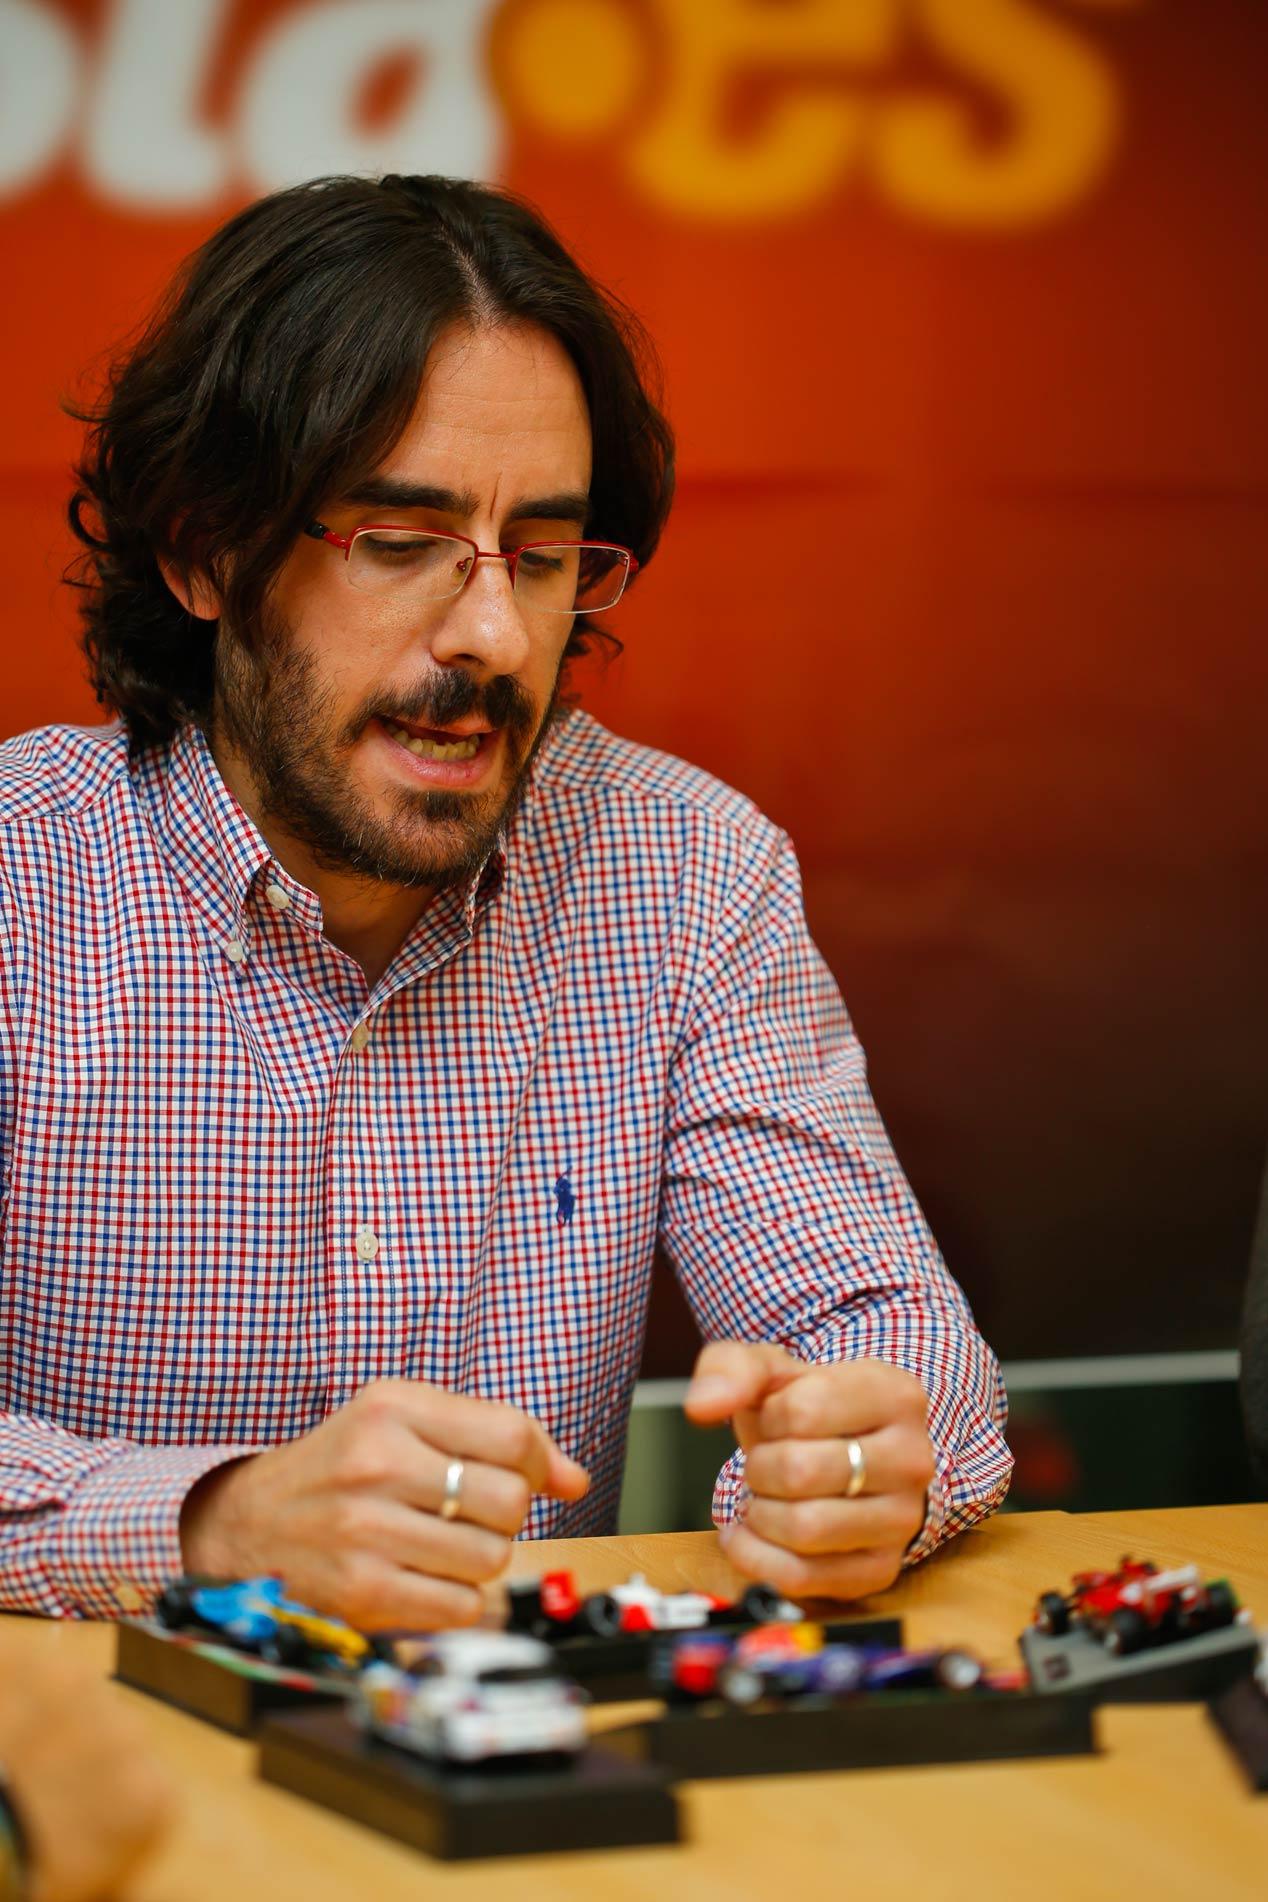 Entrevistamos a Pedro García, aerodinamicista de Fórmula 1